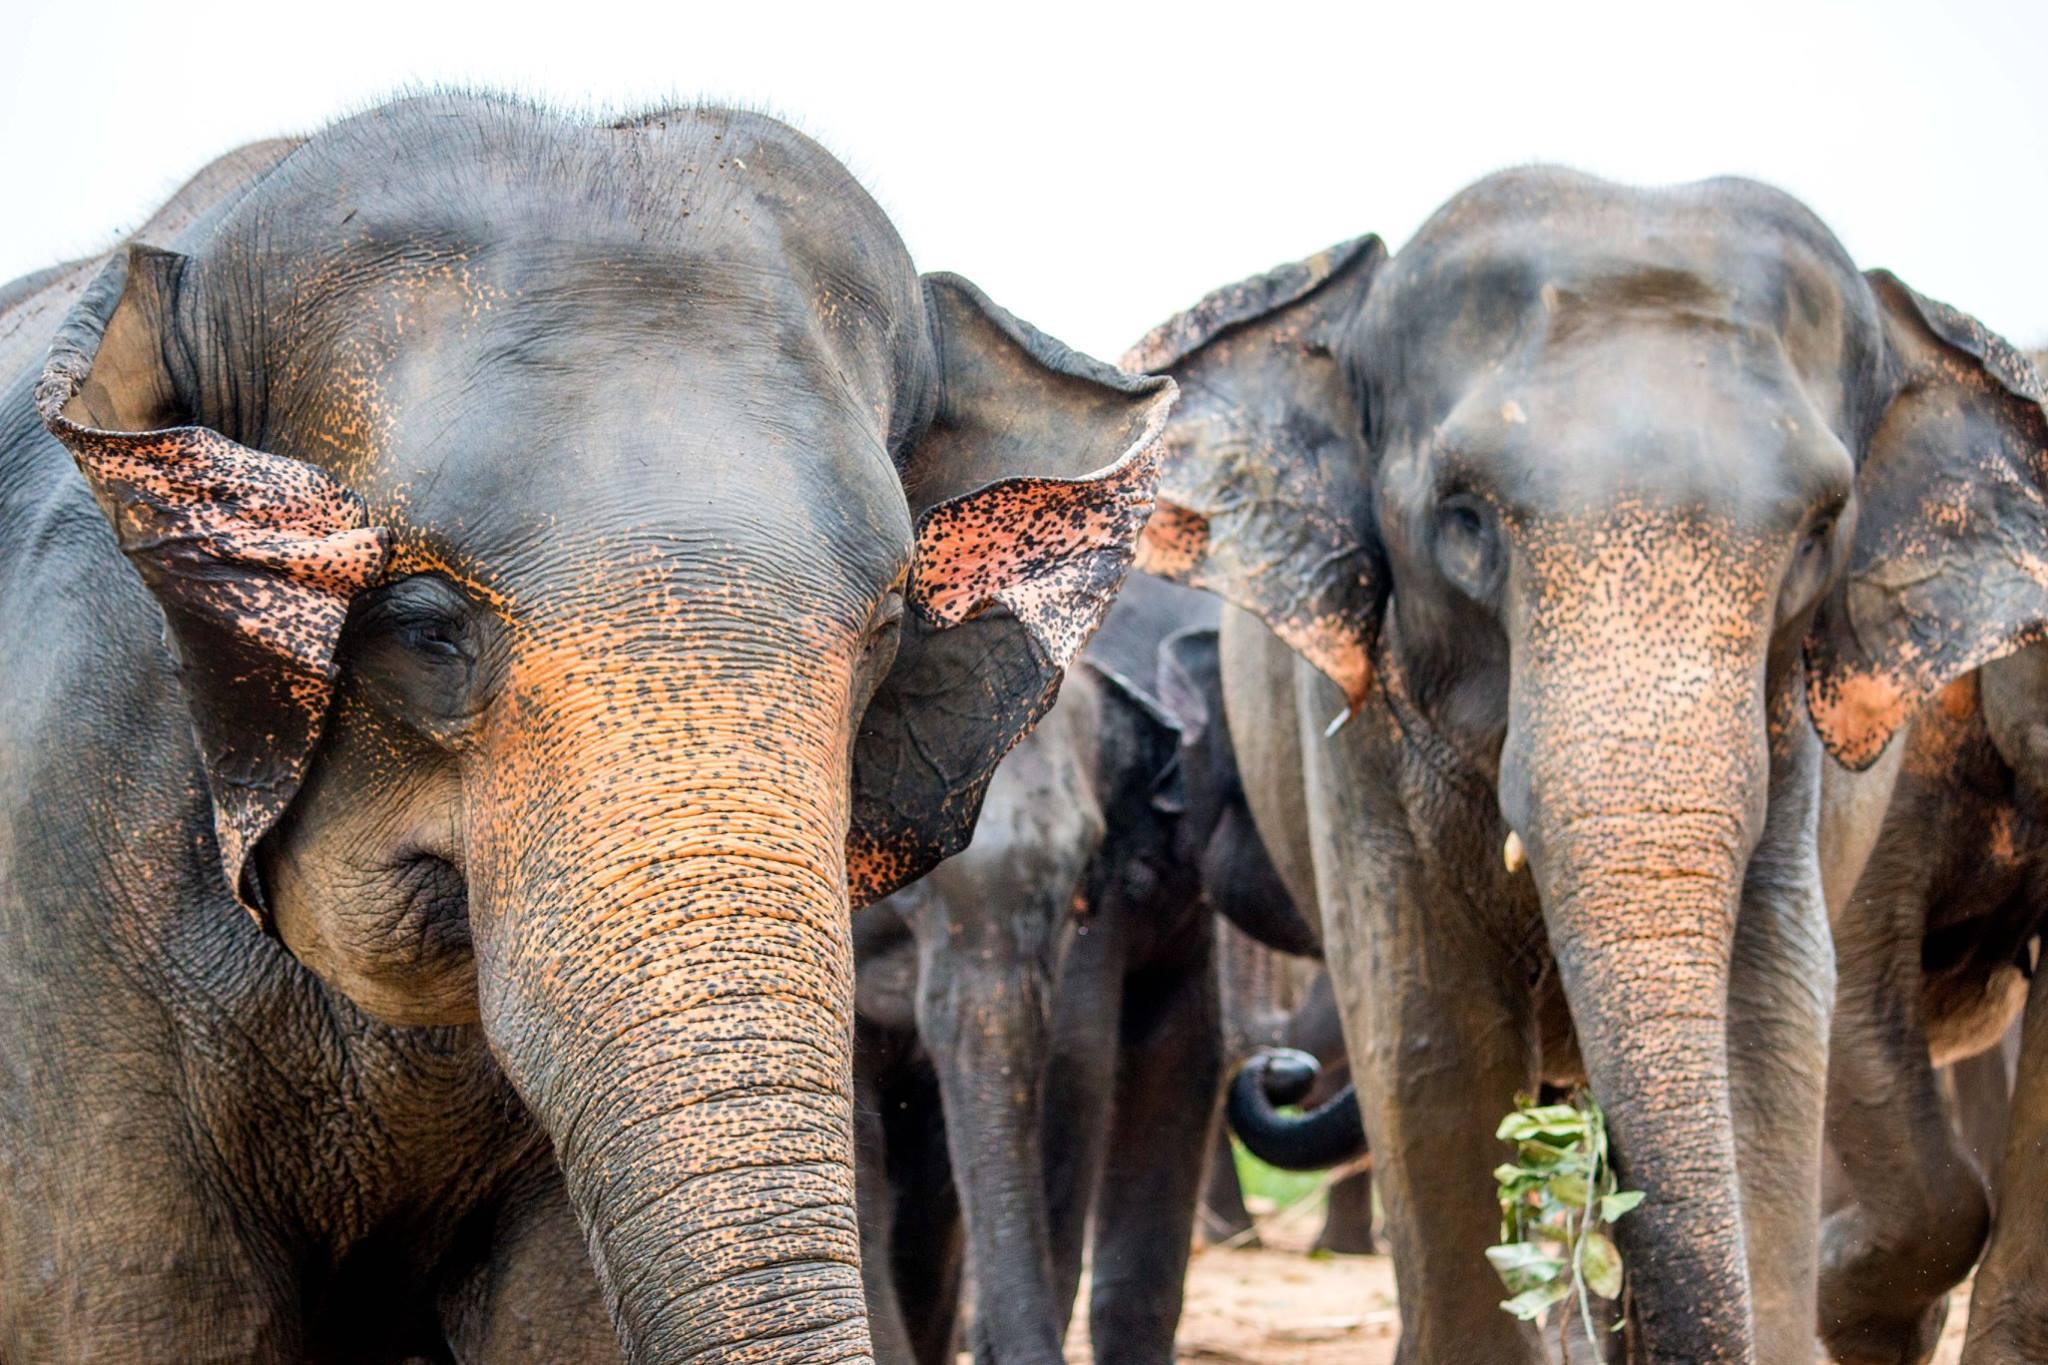 invite-to-paradise-sri-lanka-and-maldives-specialists-travel-agent-tour-operator-customer-review--feedback-joel-rhian-wildlife-eephants-1.jpg